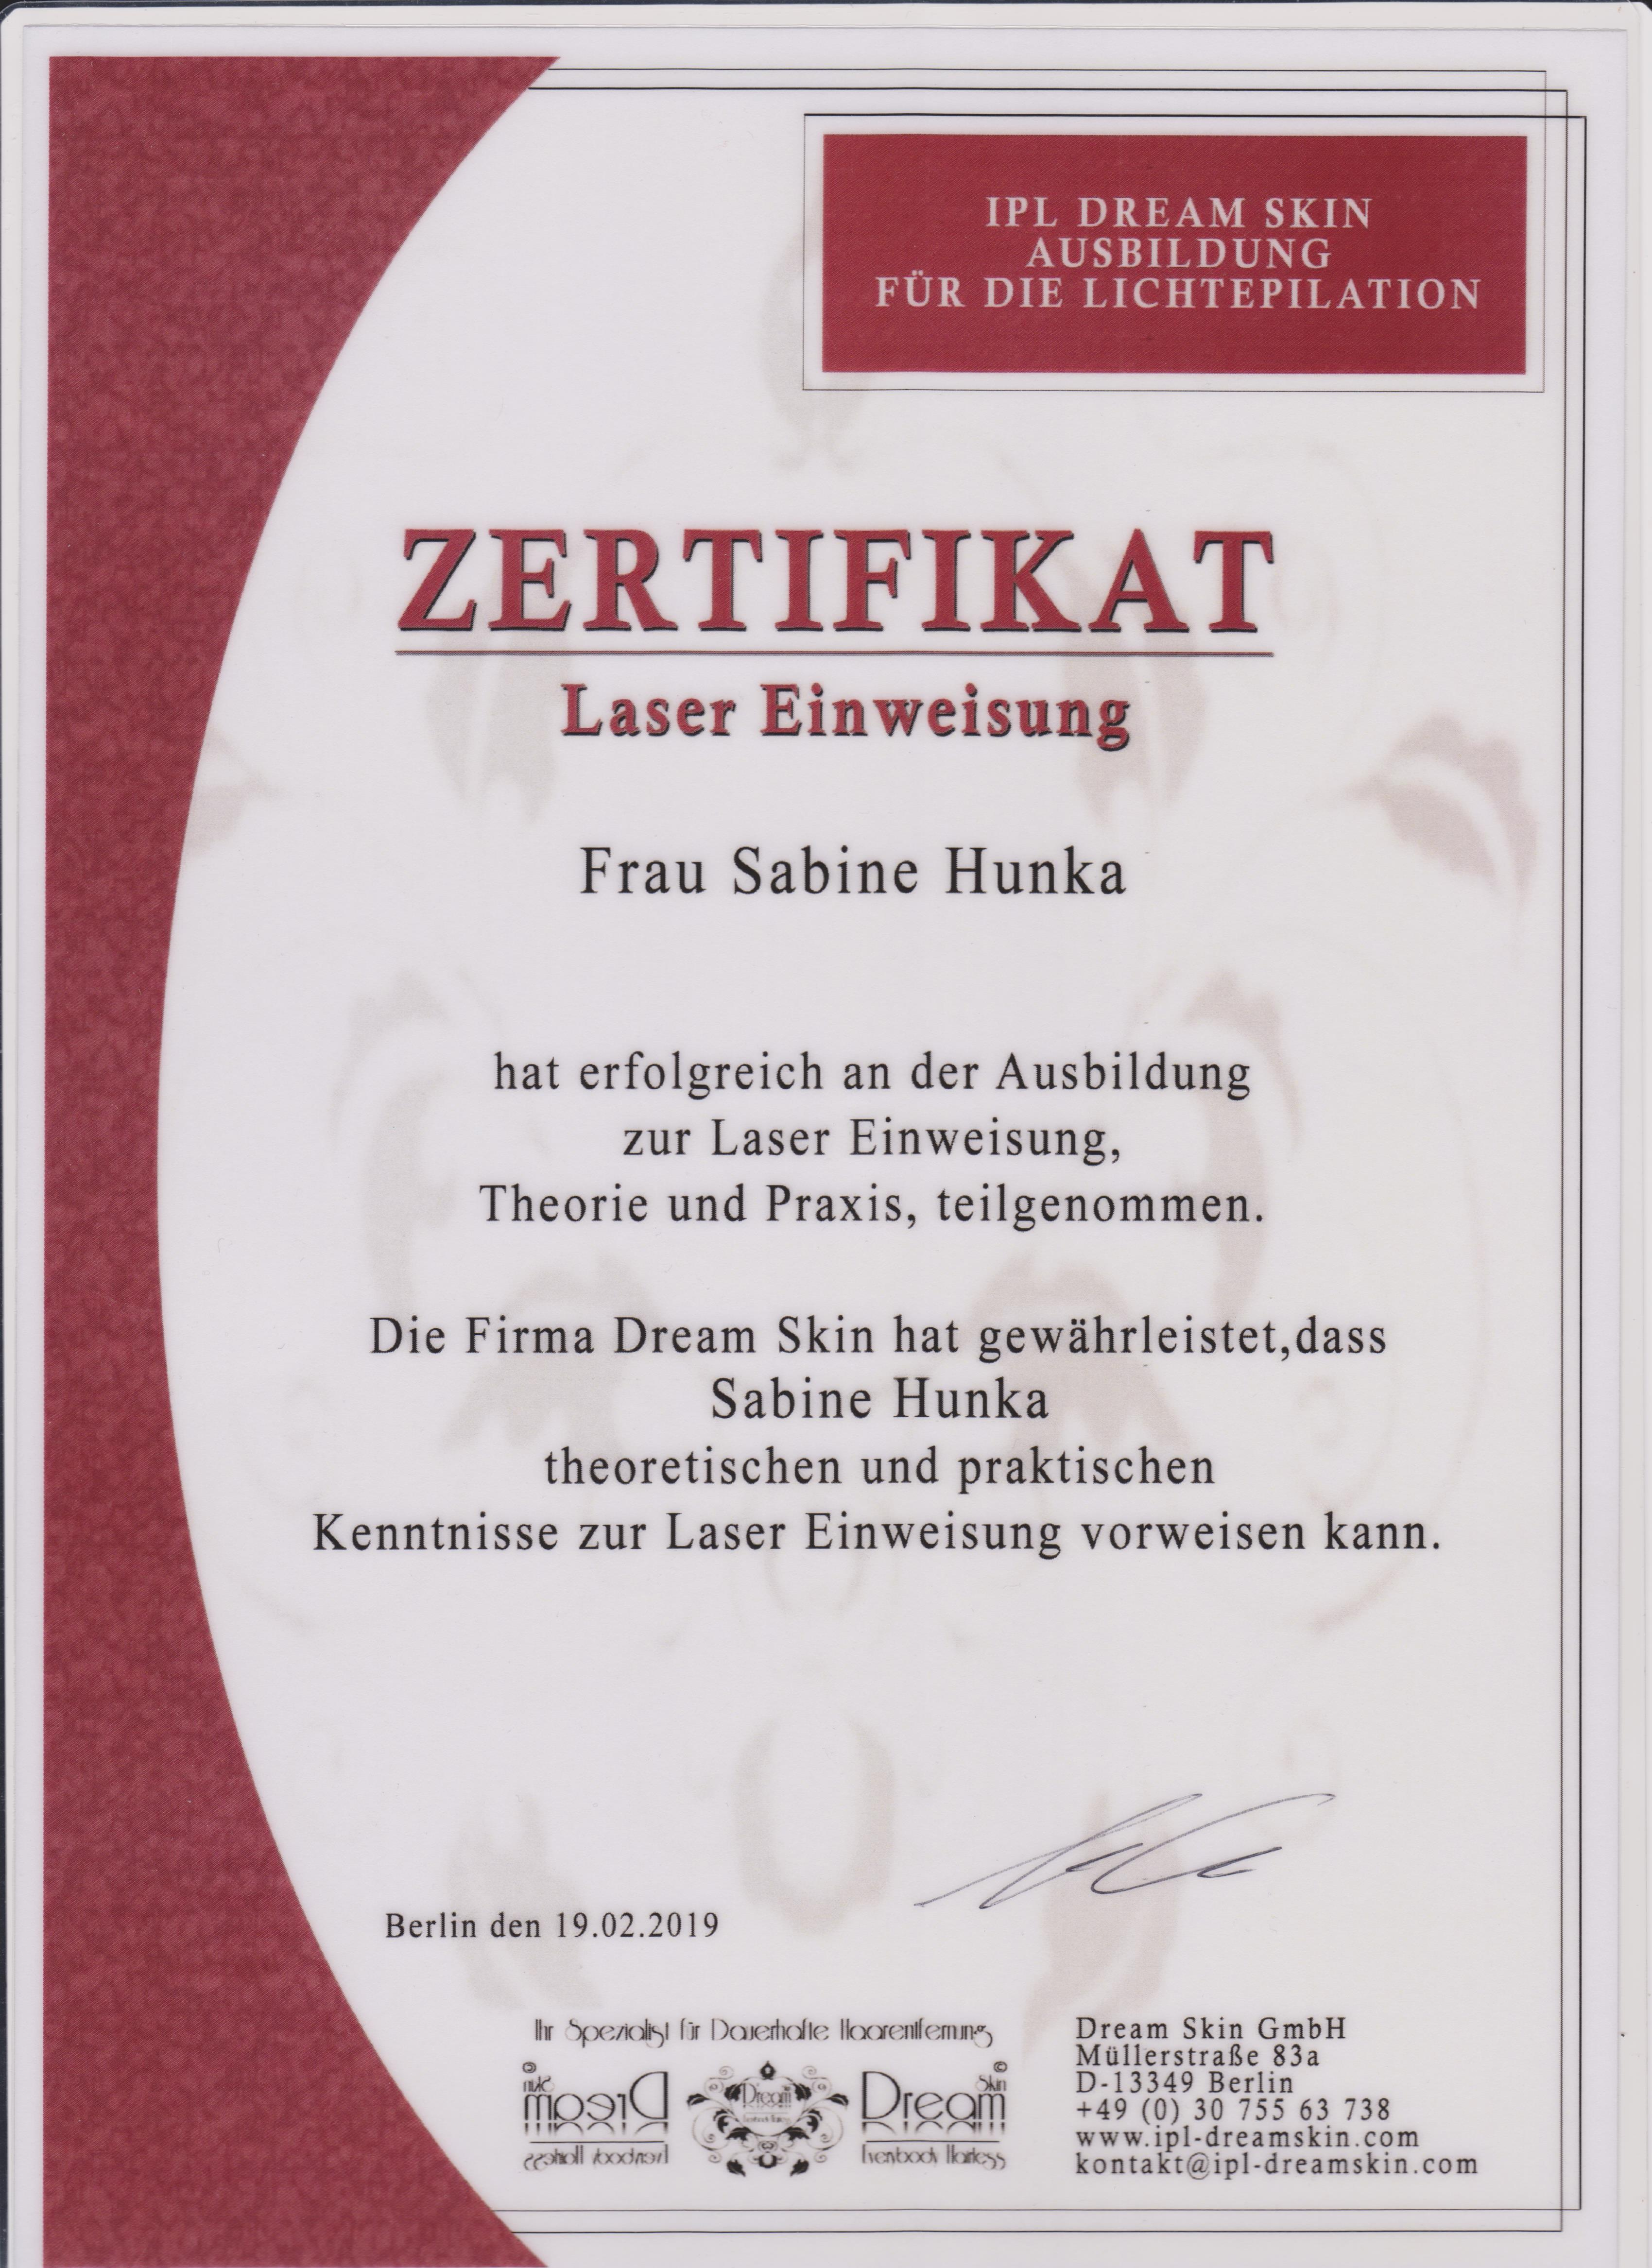 LaserZertifikat 001